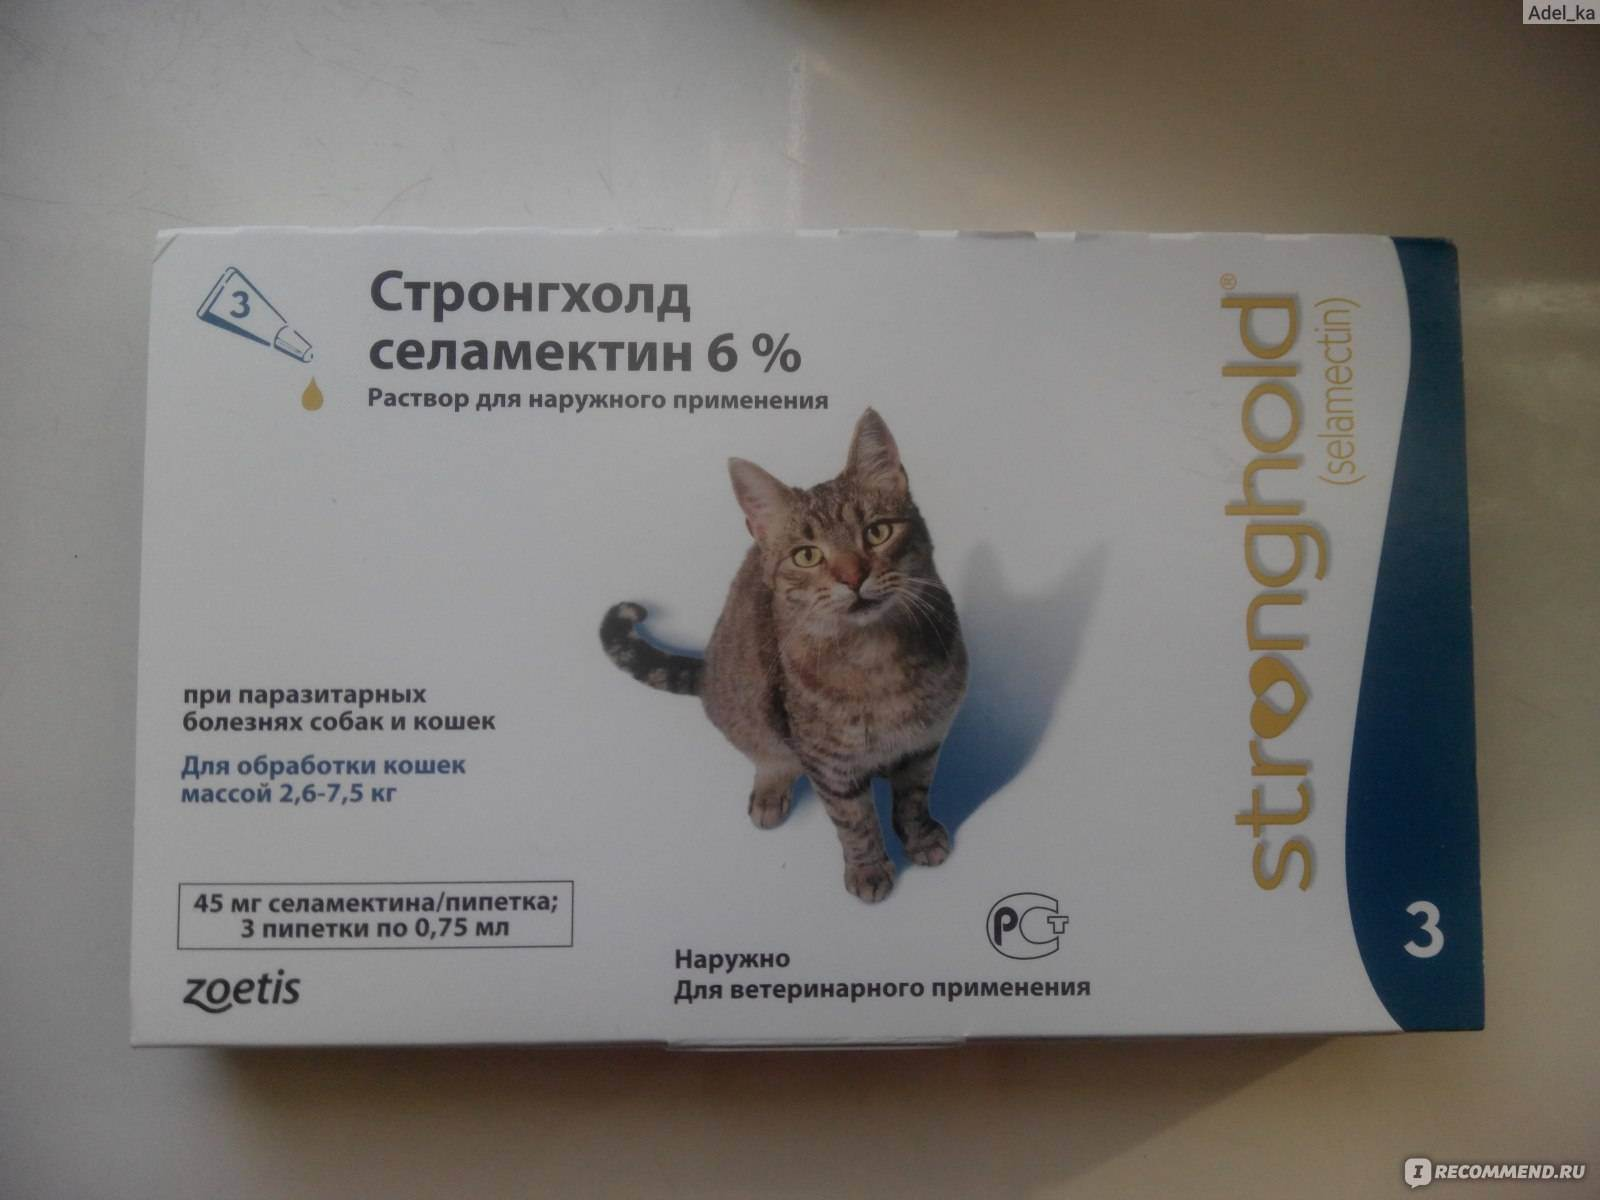 Как давать кошкам стронгхолд